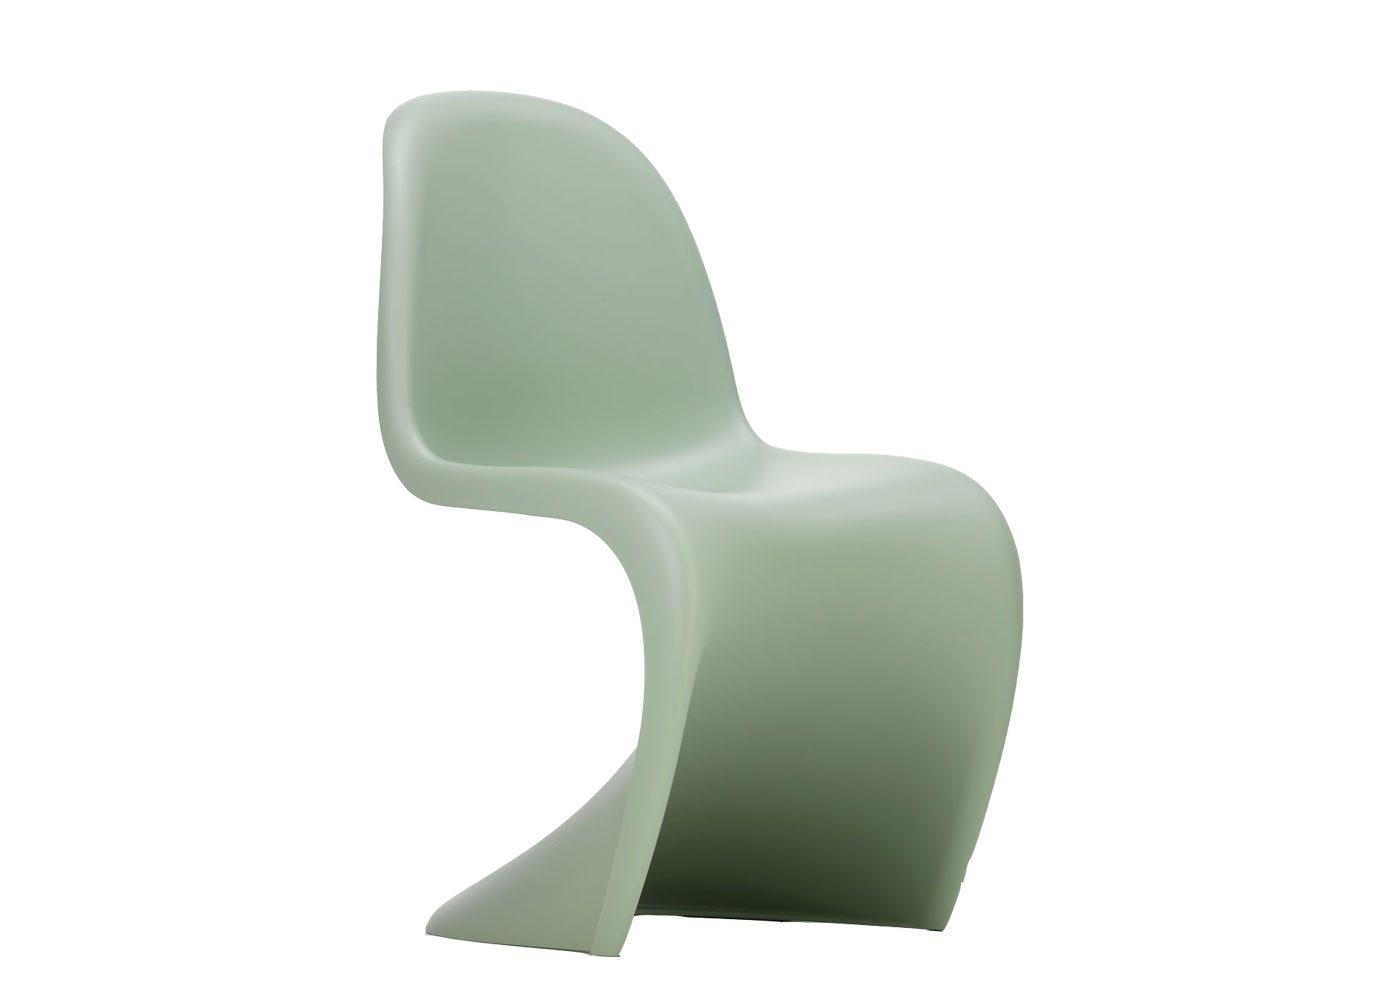 Vitra Panton Chair Soft Mint New Height